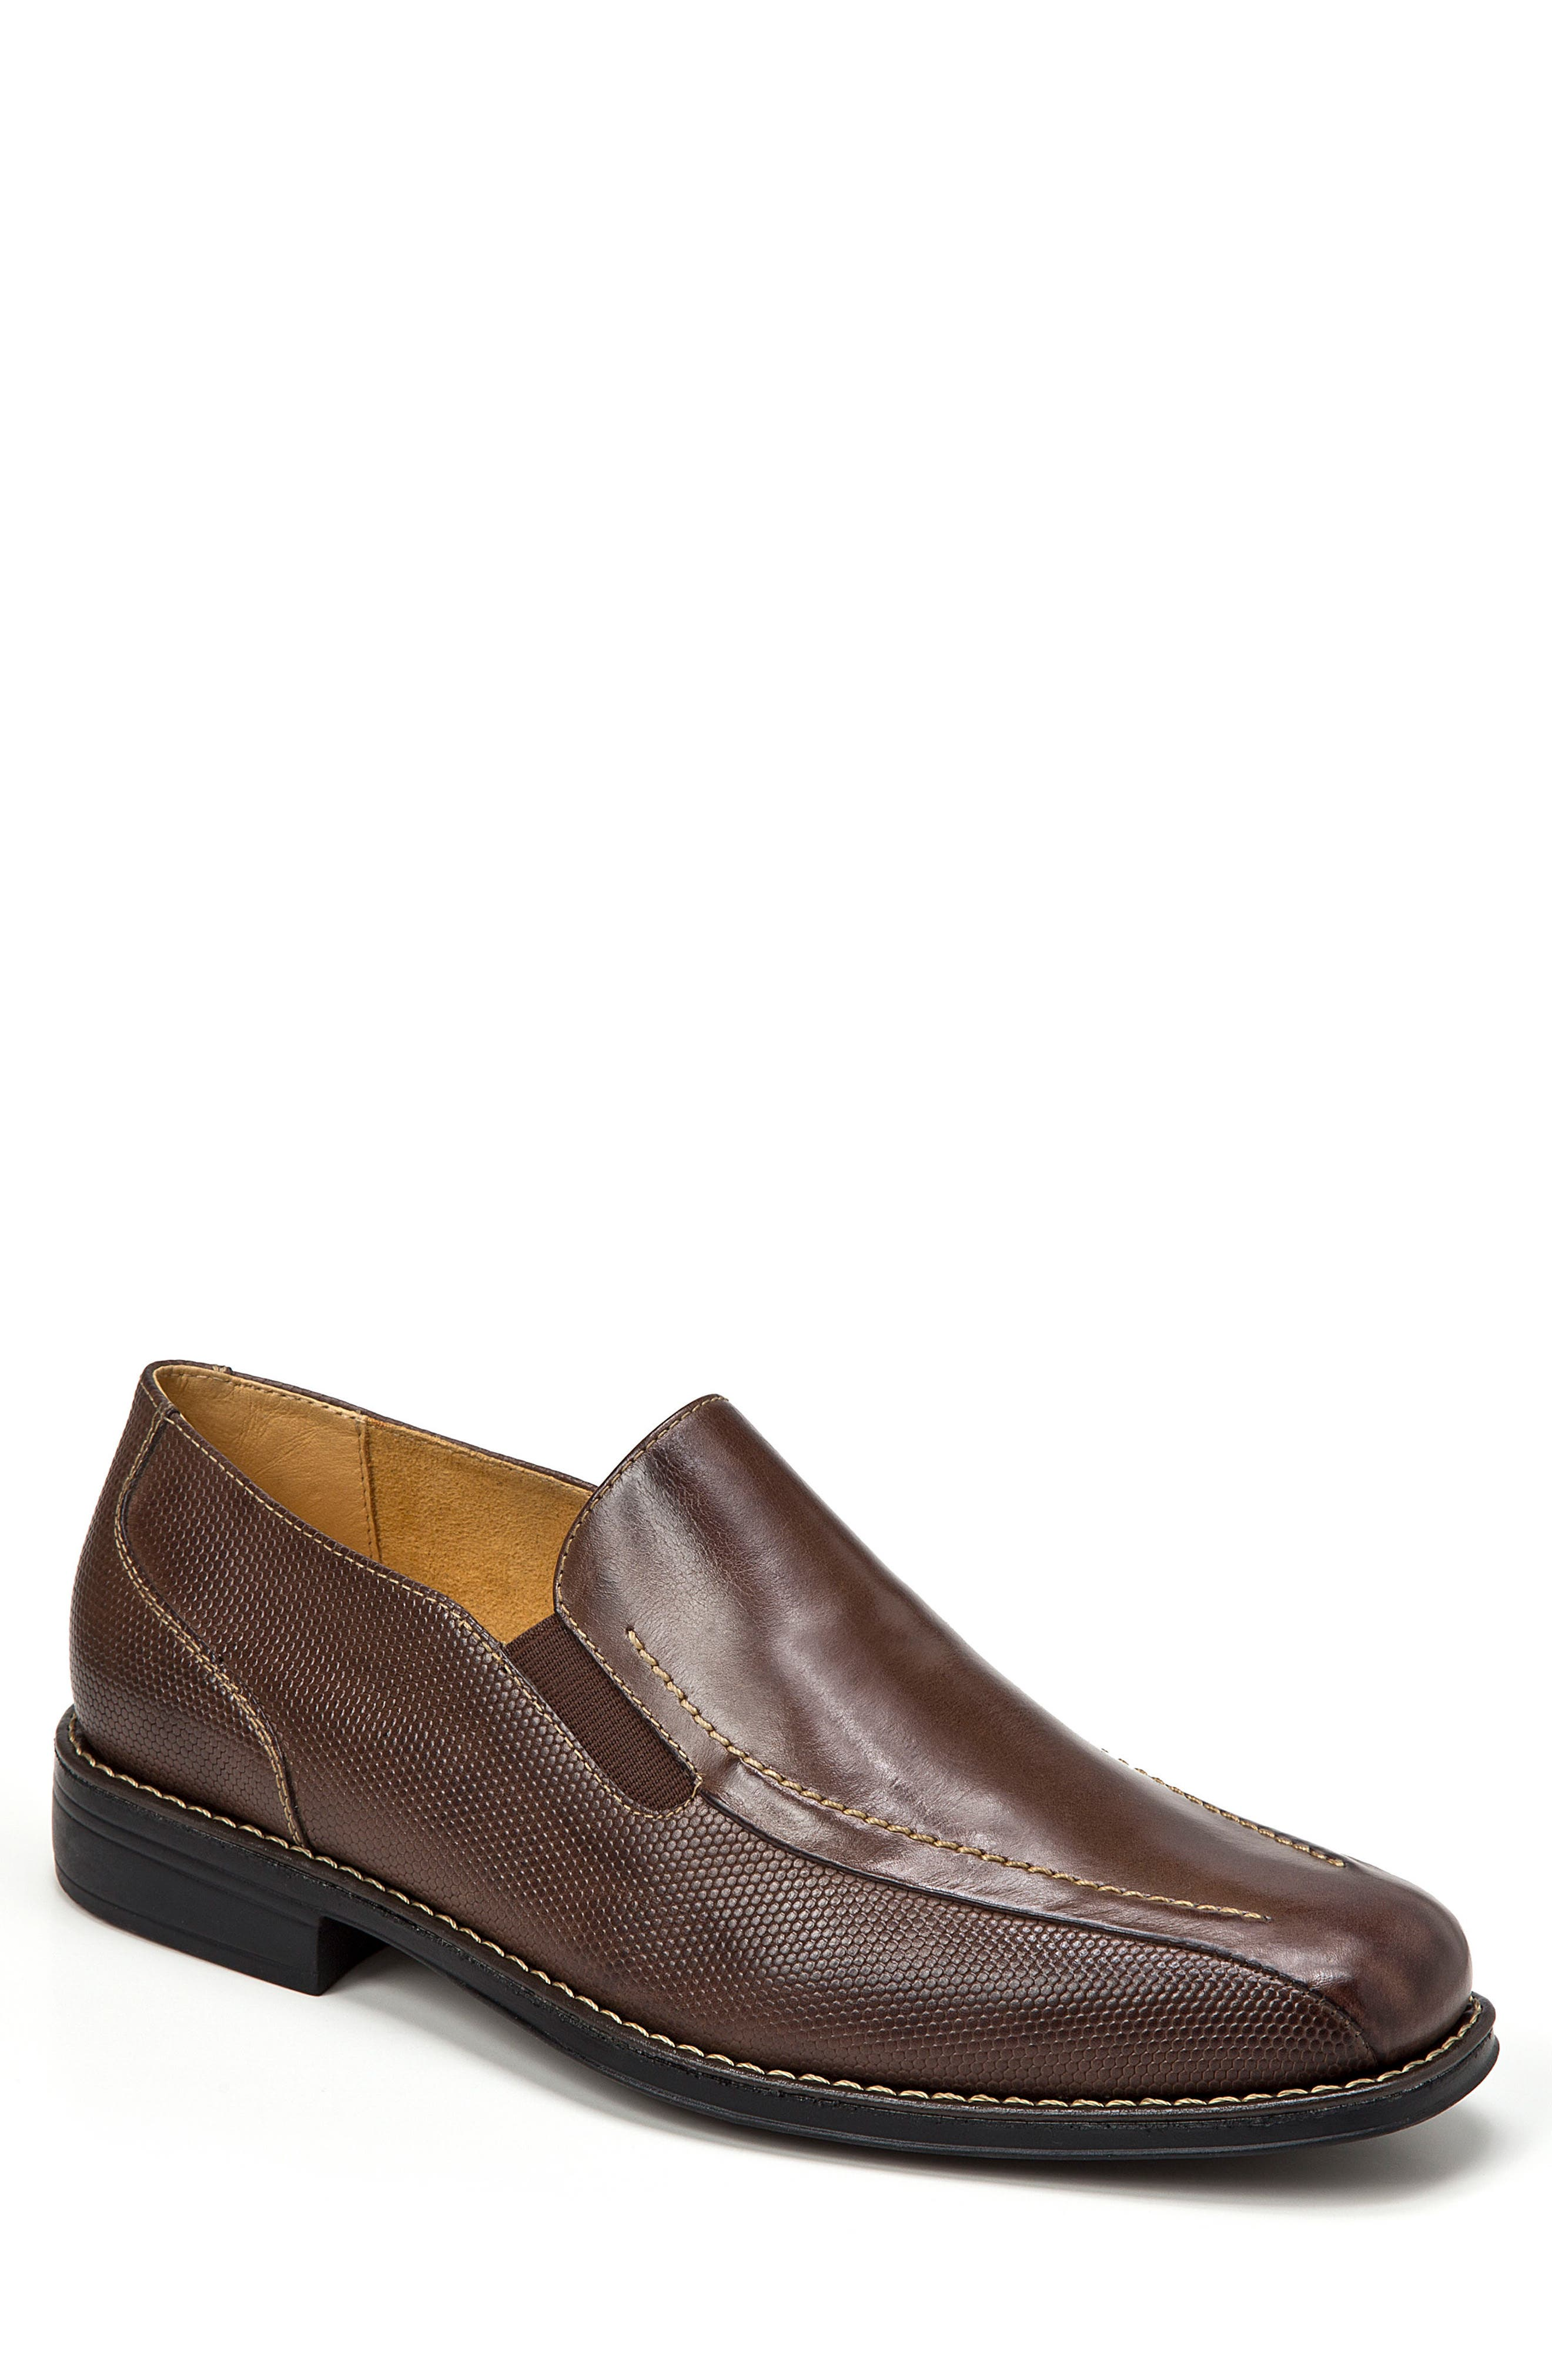 Enzo Venetian Loafer,                         Main,                         color, BROWN